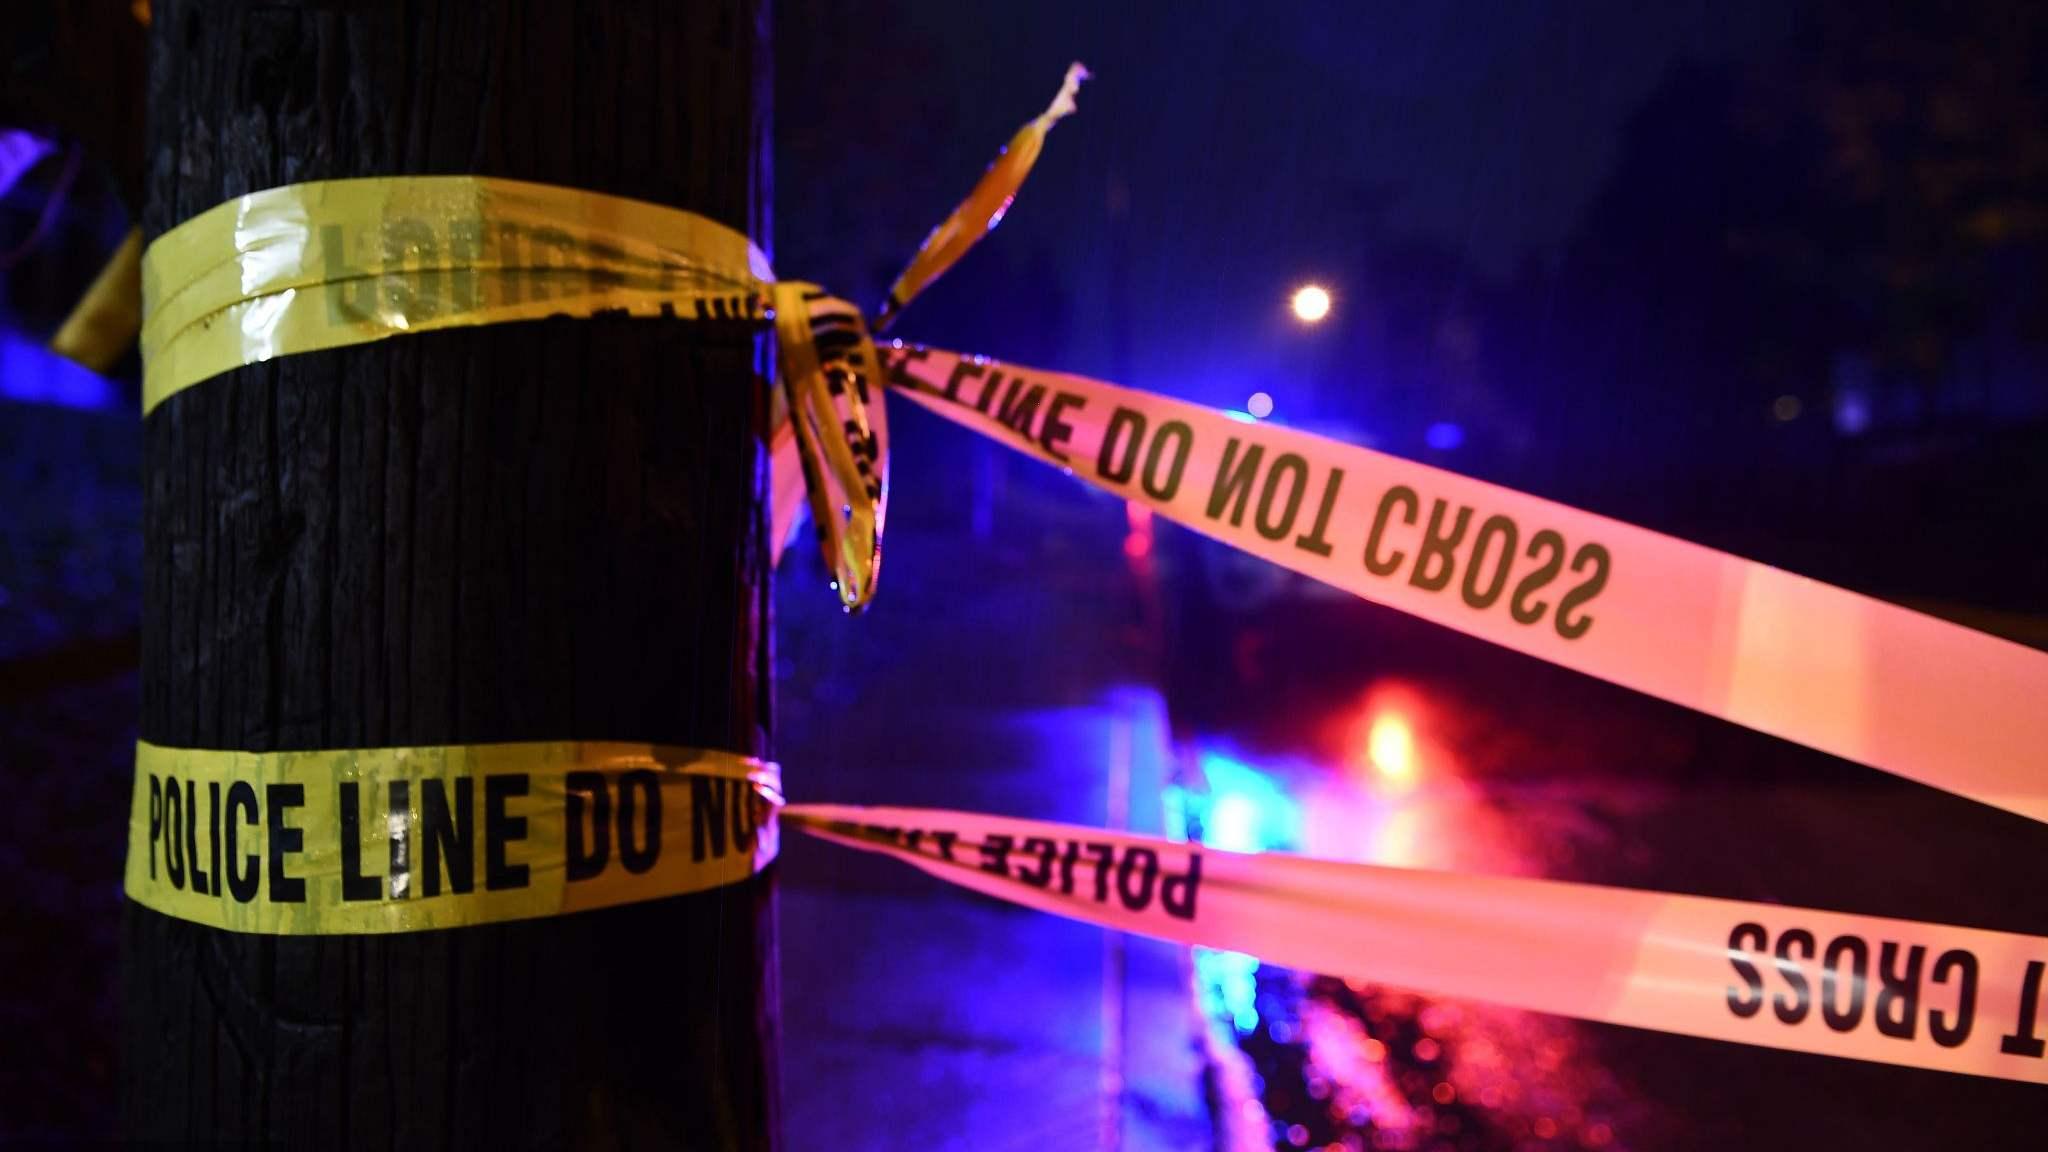 Hate crimes, anti-Semitic attacks on the rise in US: FBI